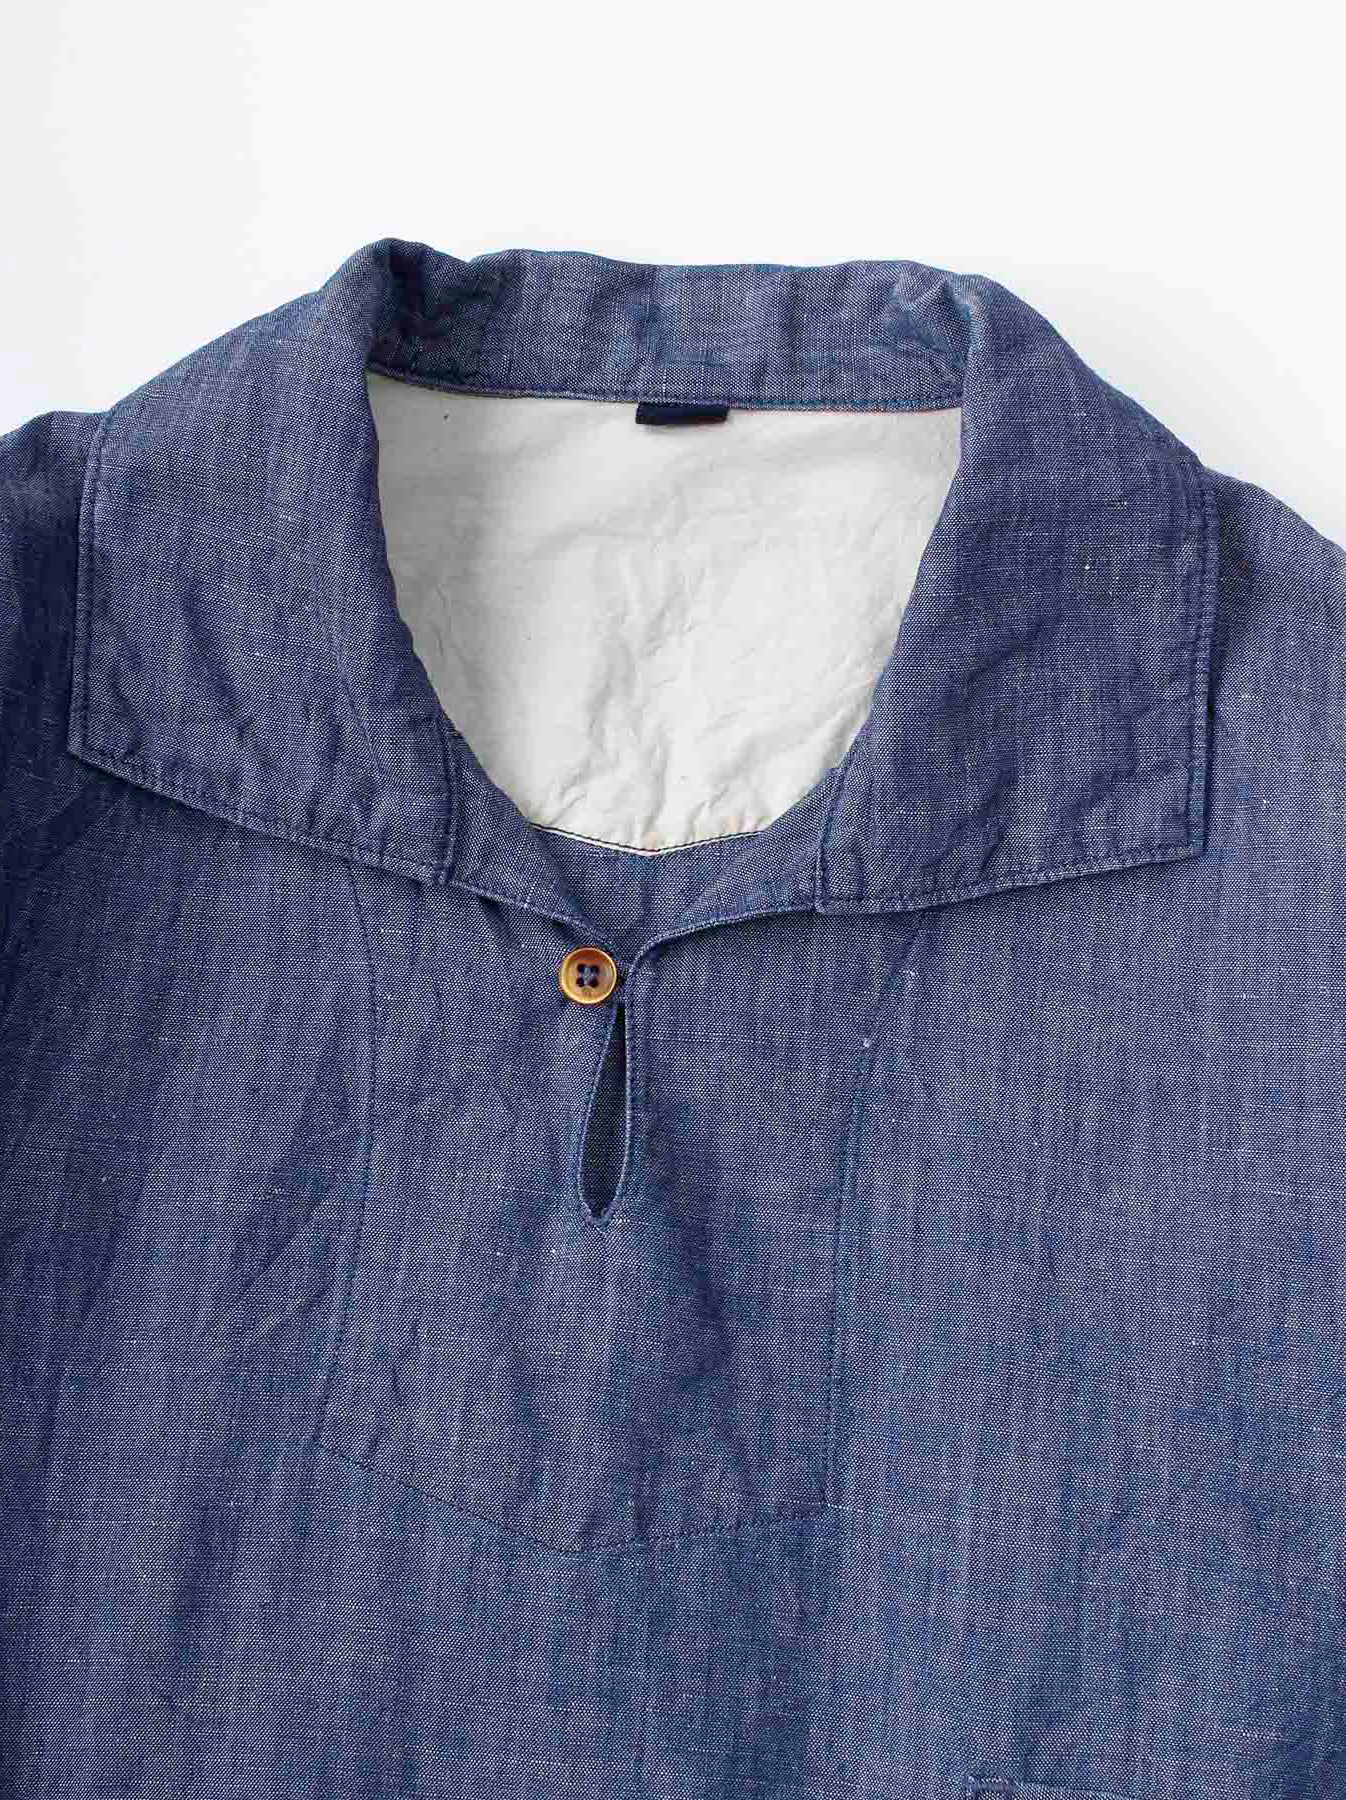 WH Cotton Linen Umahiko Pullover Shirt-7